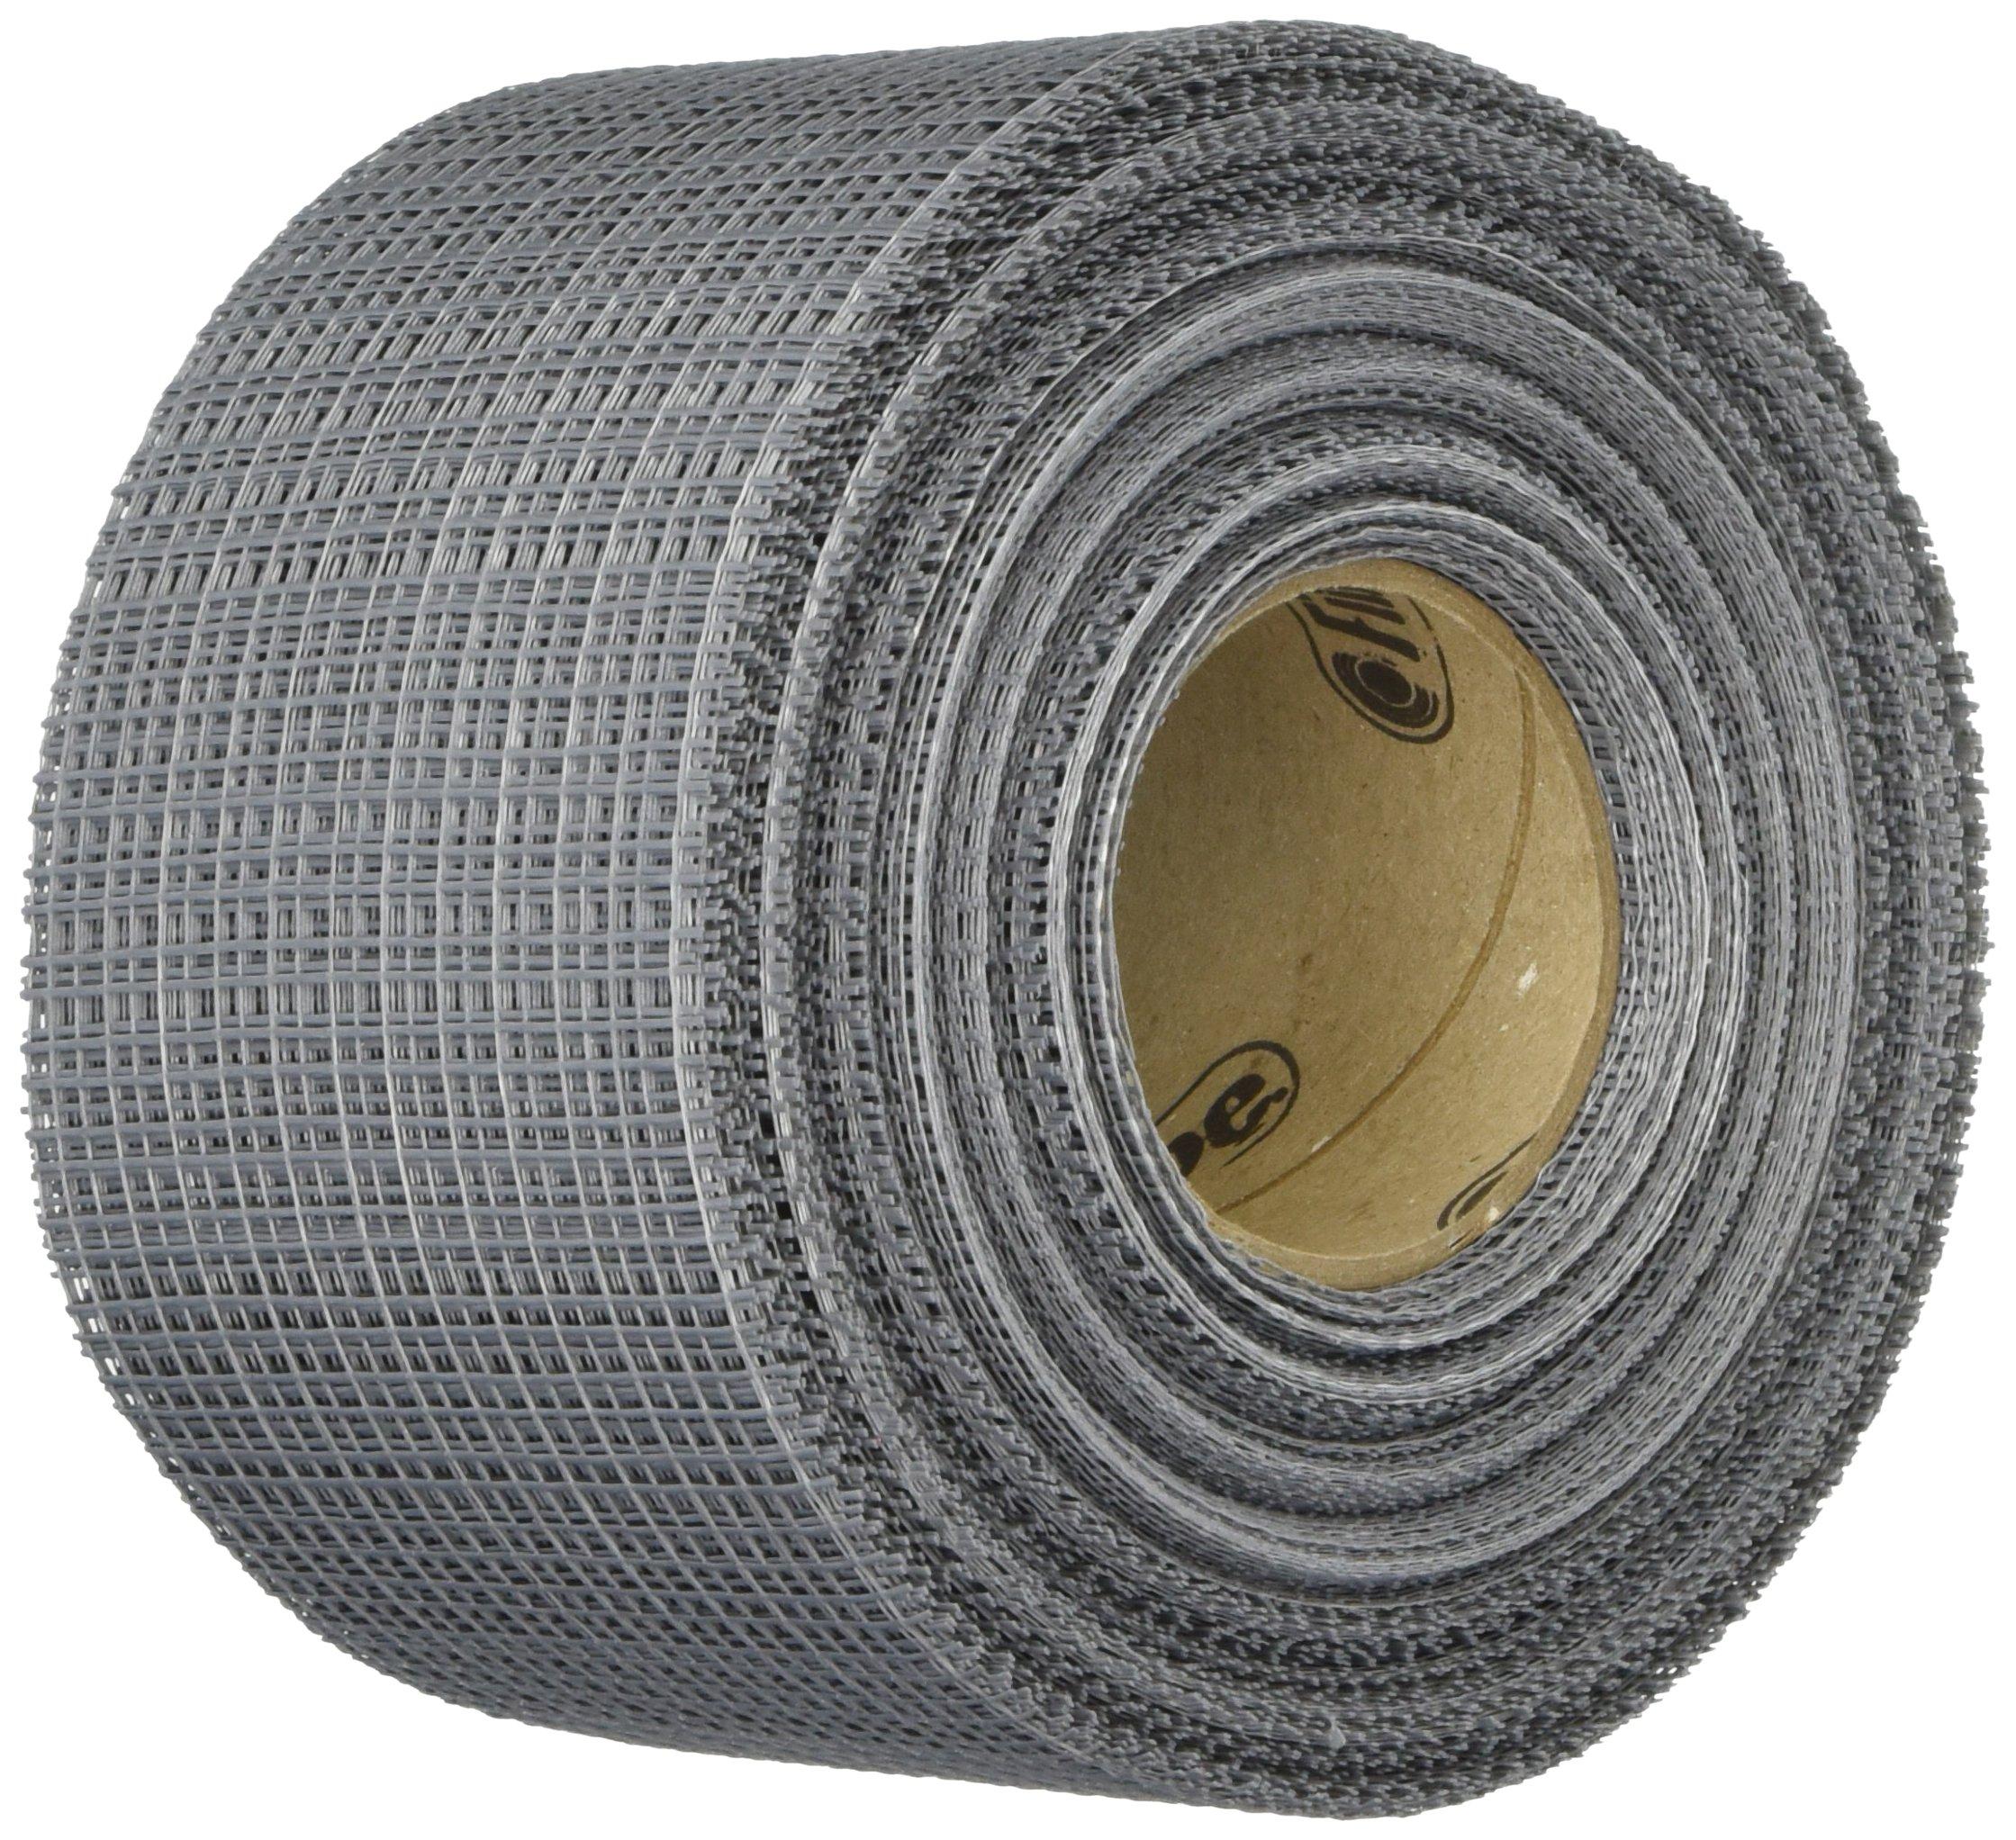 Saint-GOBAIN ADFORS FDW6655-U Cement Board Tape, 3'' x 150 ft, Gray